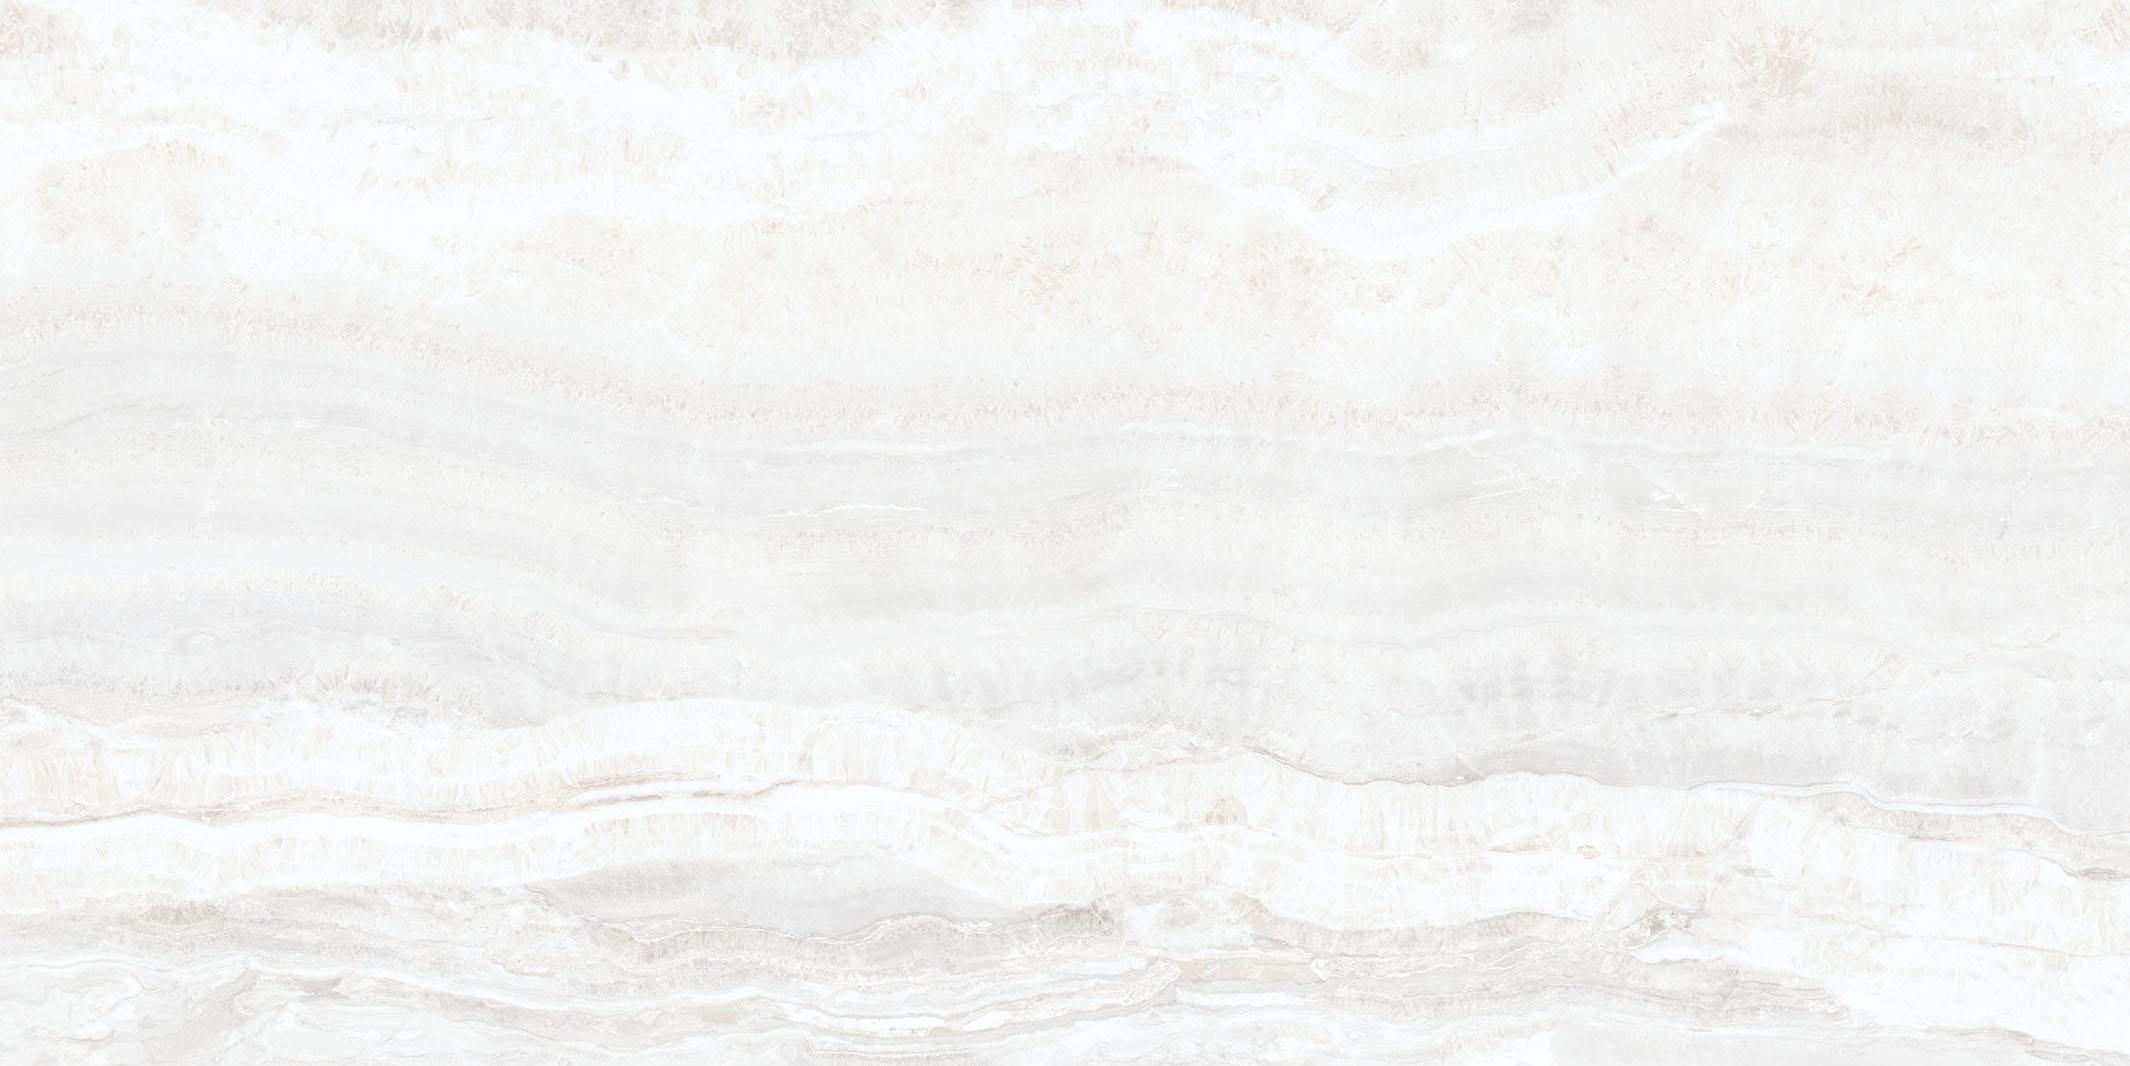 Onyx of Cerim White Glossy 10mm 30 x 60